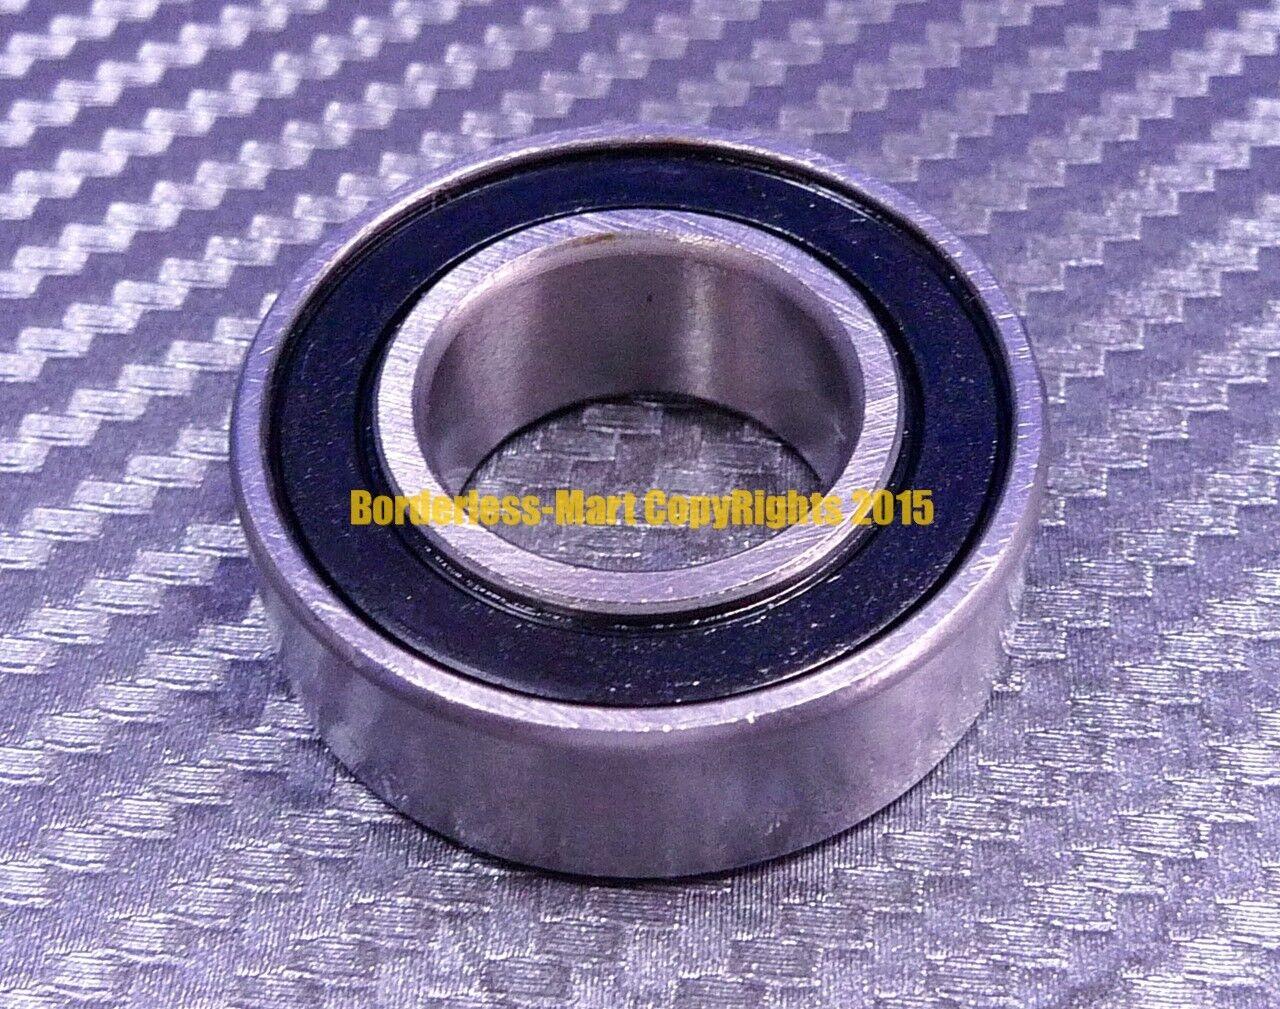 [5 Pcs] 15267-2RS (15x26x7 mm) Rubber Sealed Ball Bearing Bearings 15267RS BLACK